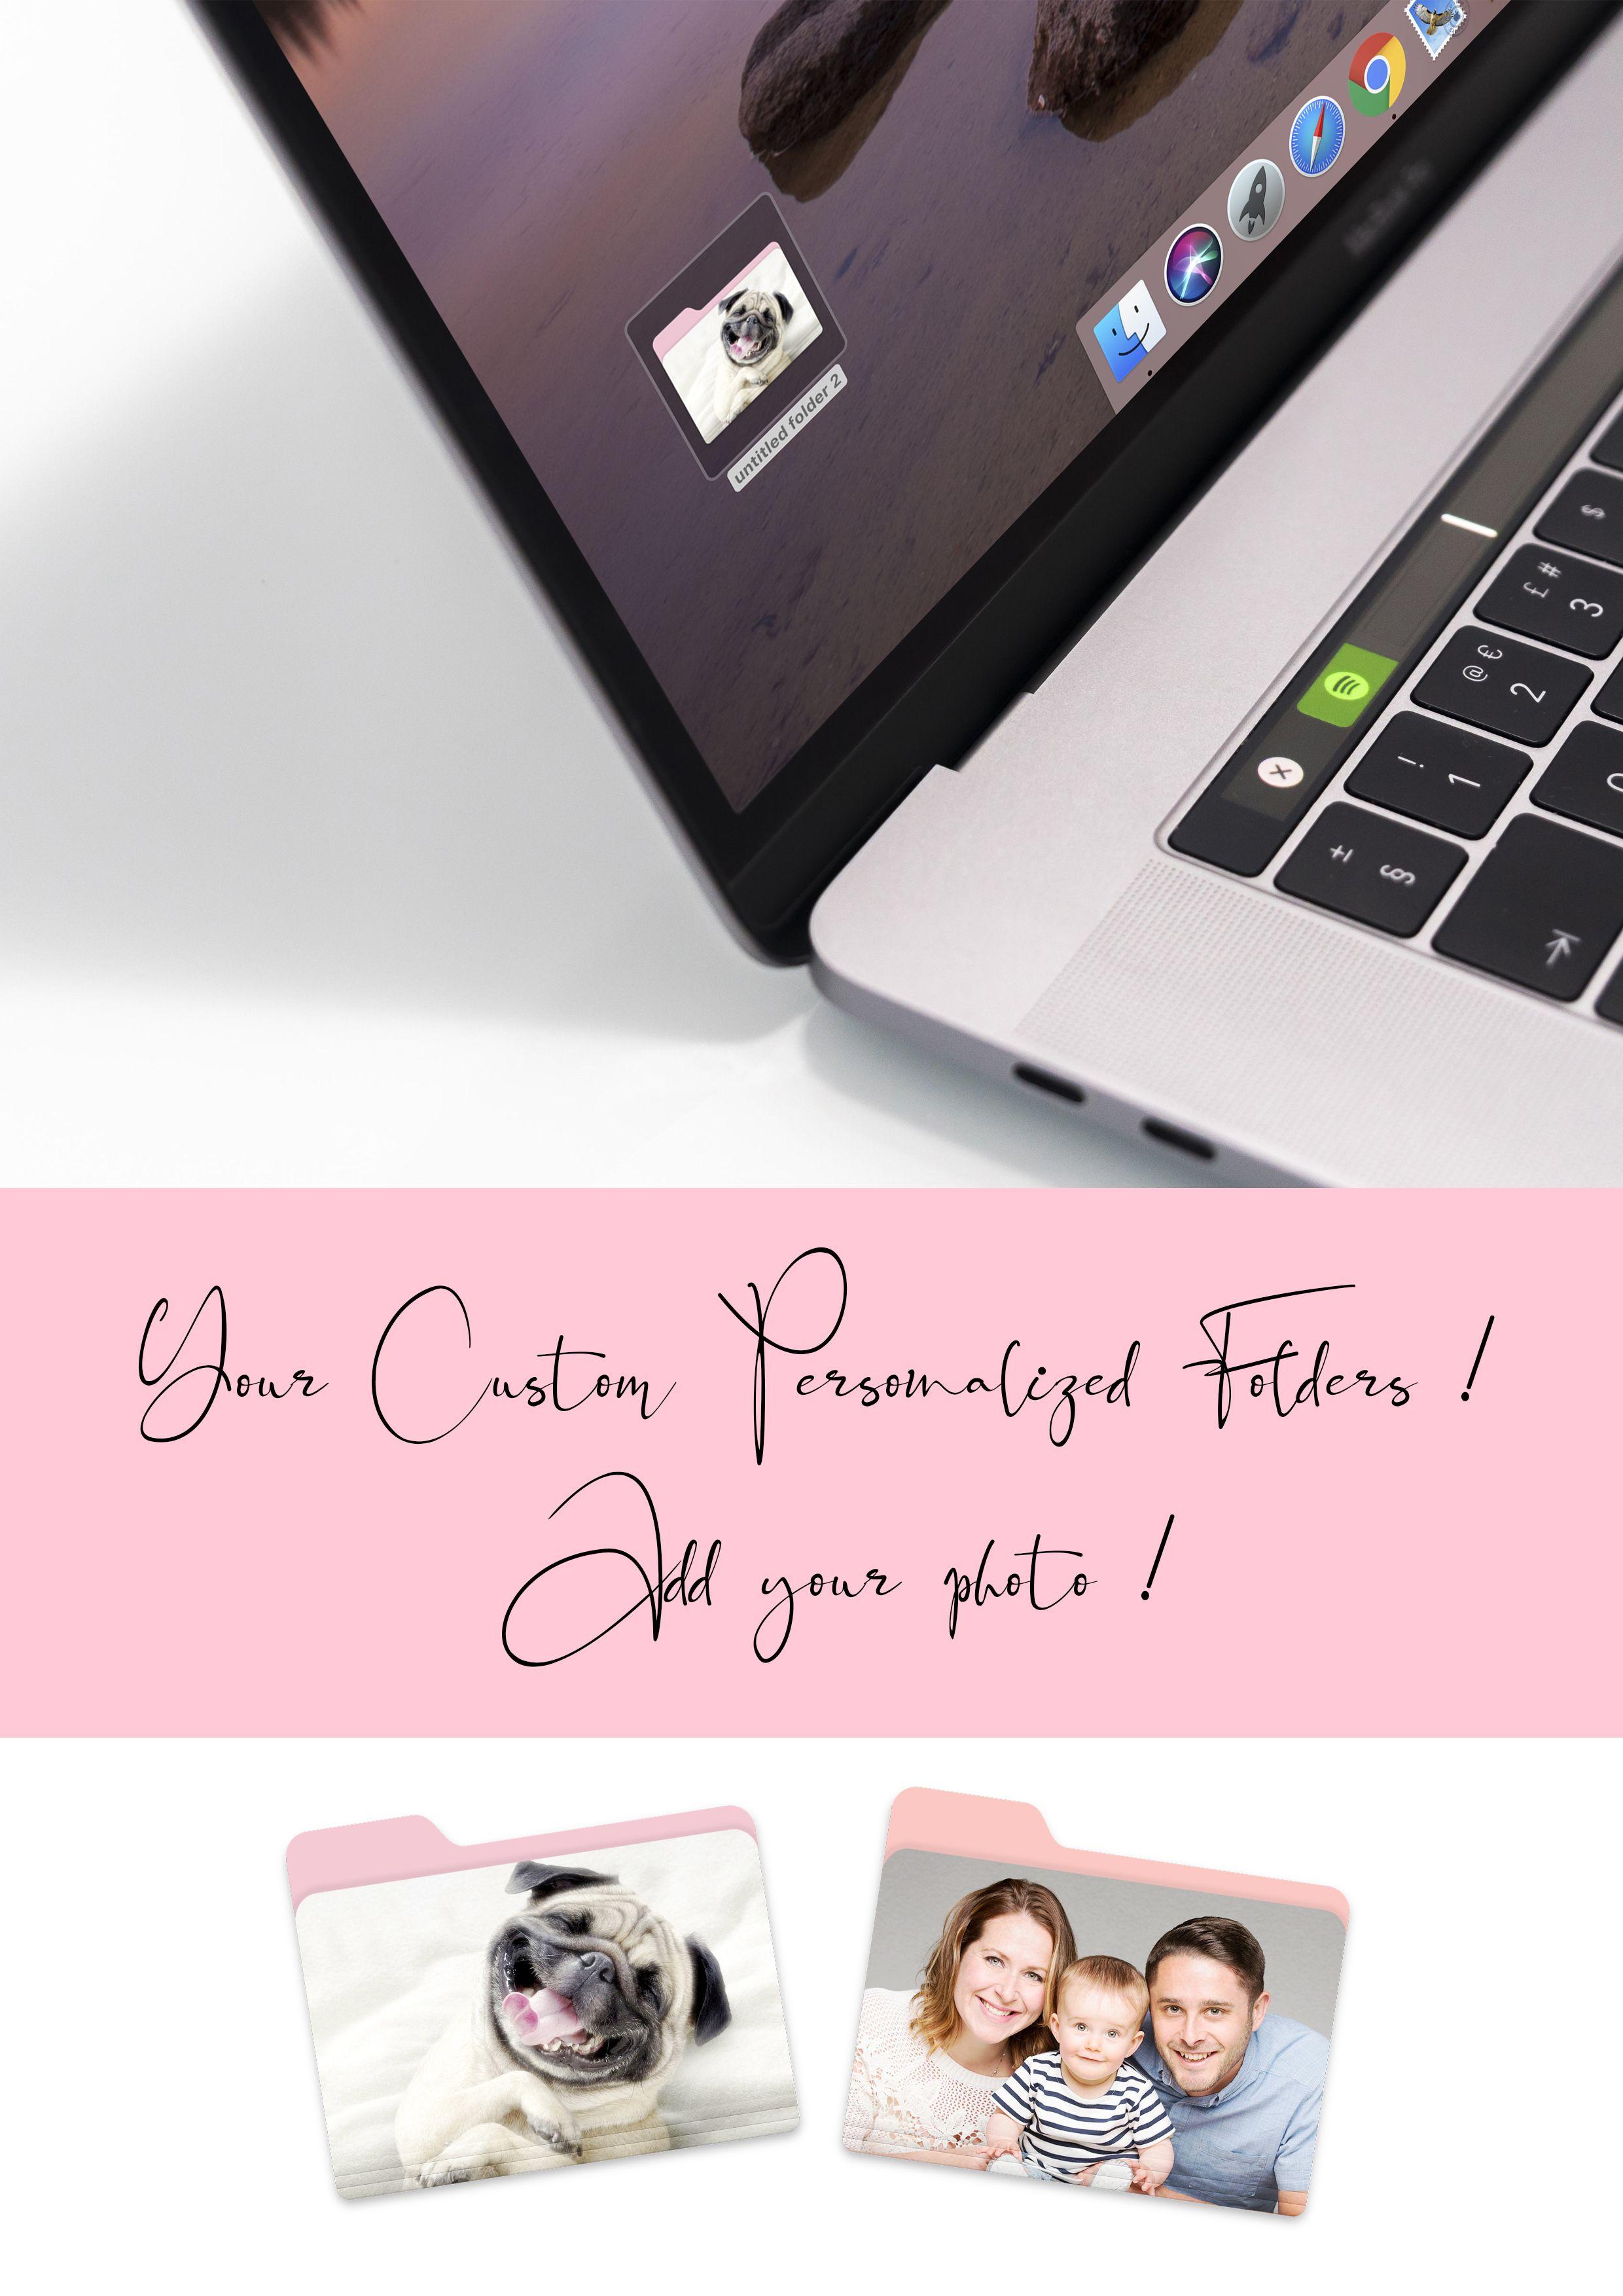 Custom personalized folders for imac add your photo custom